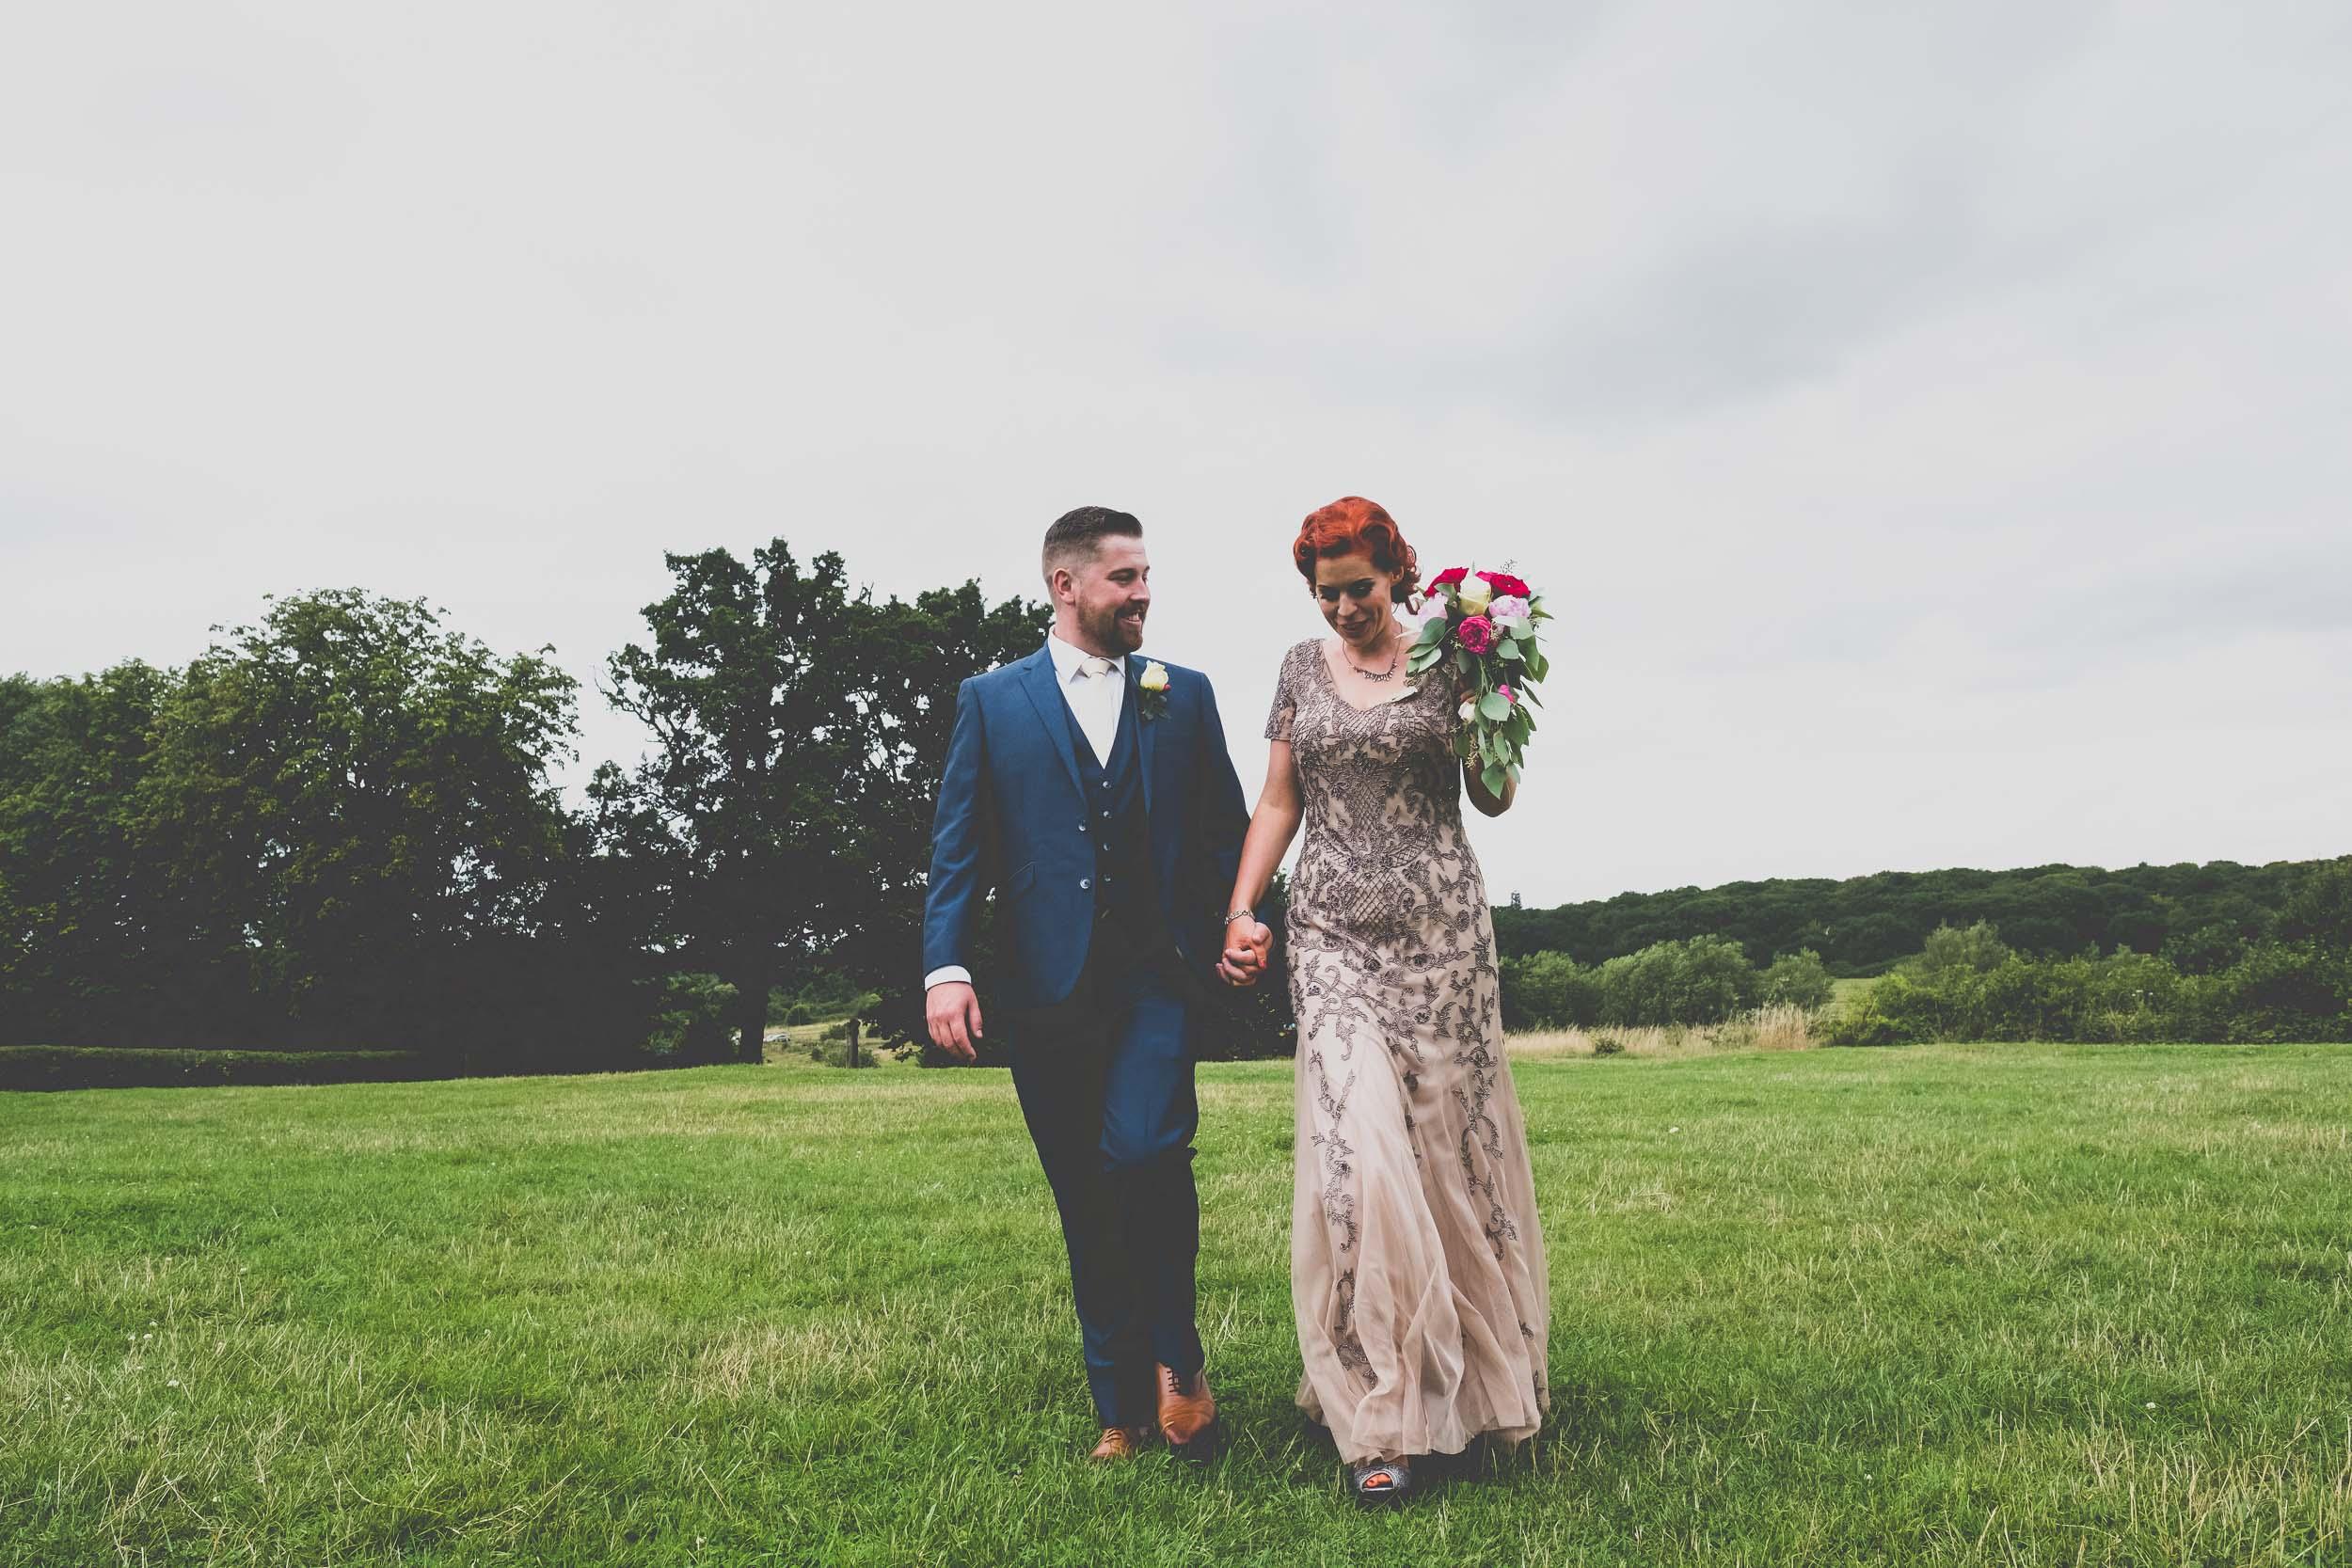 queen-elizabeths-hunting-lodge-epping-forest-wedding209.jpg